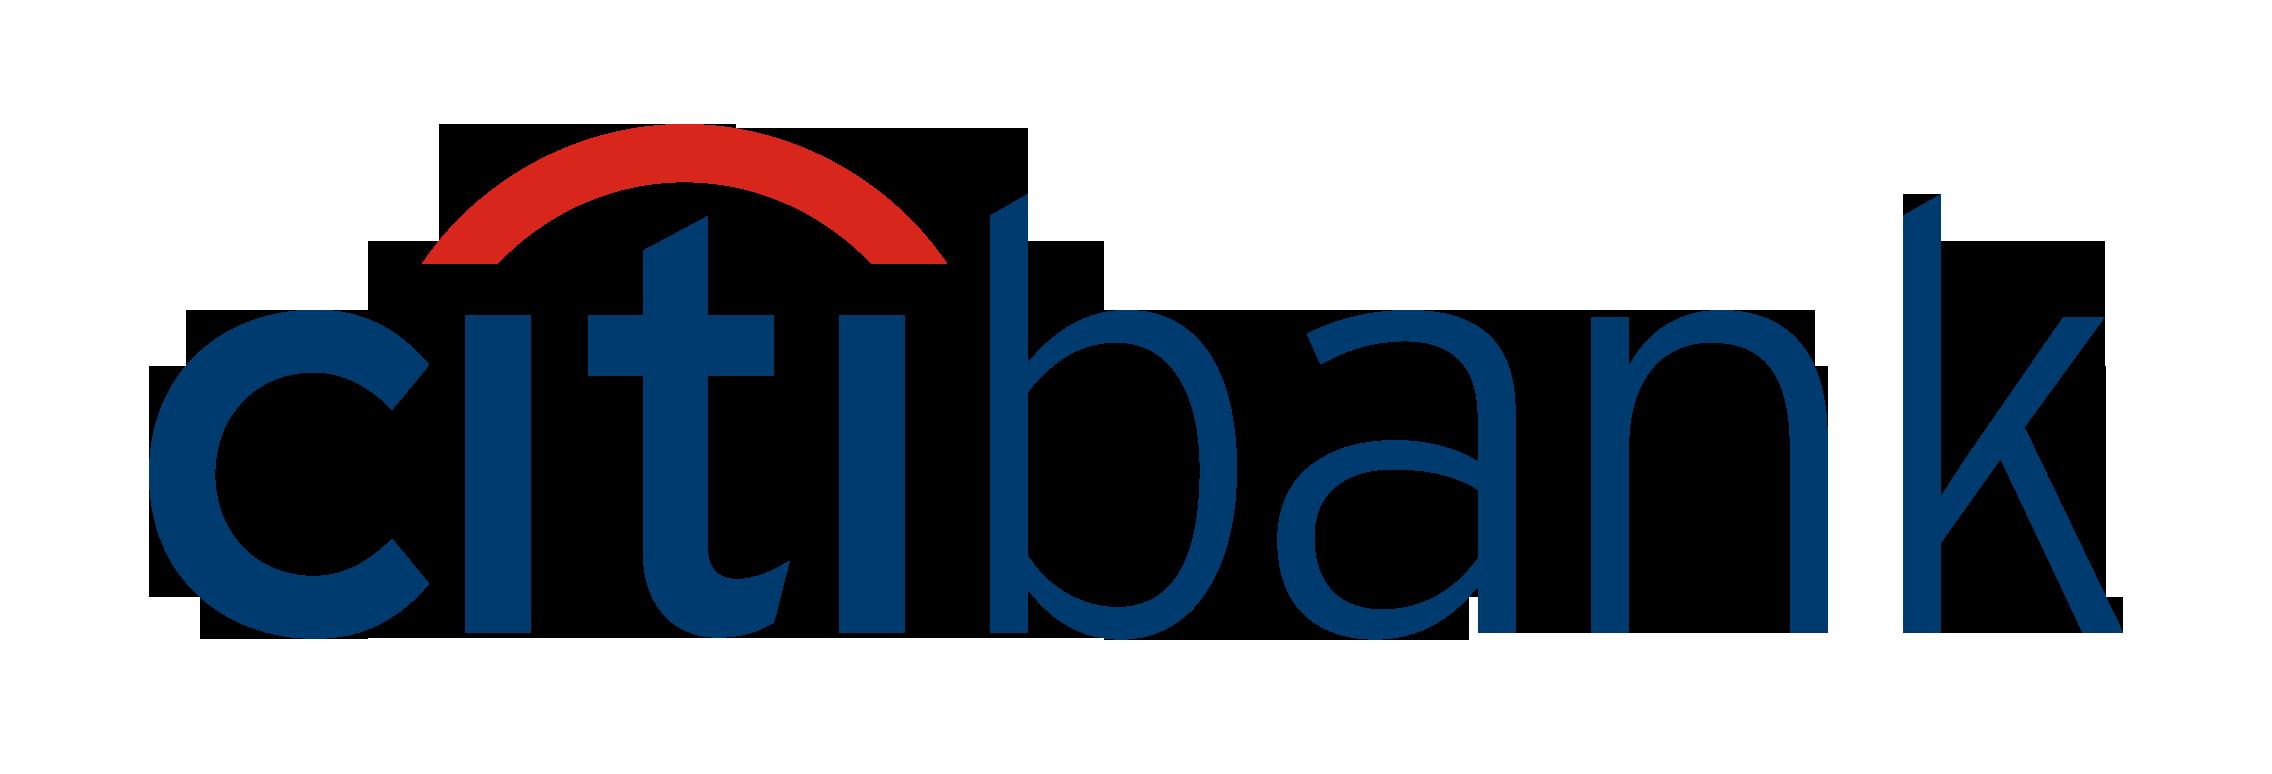 Citibank logo